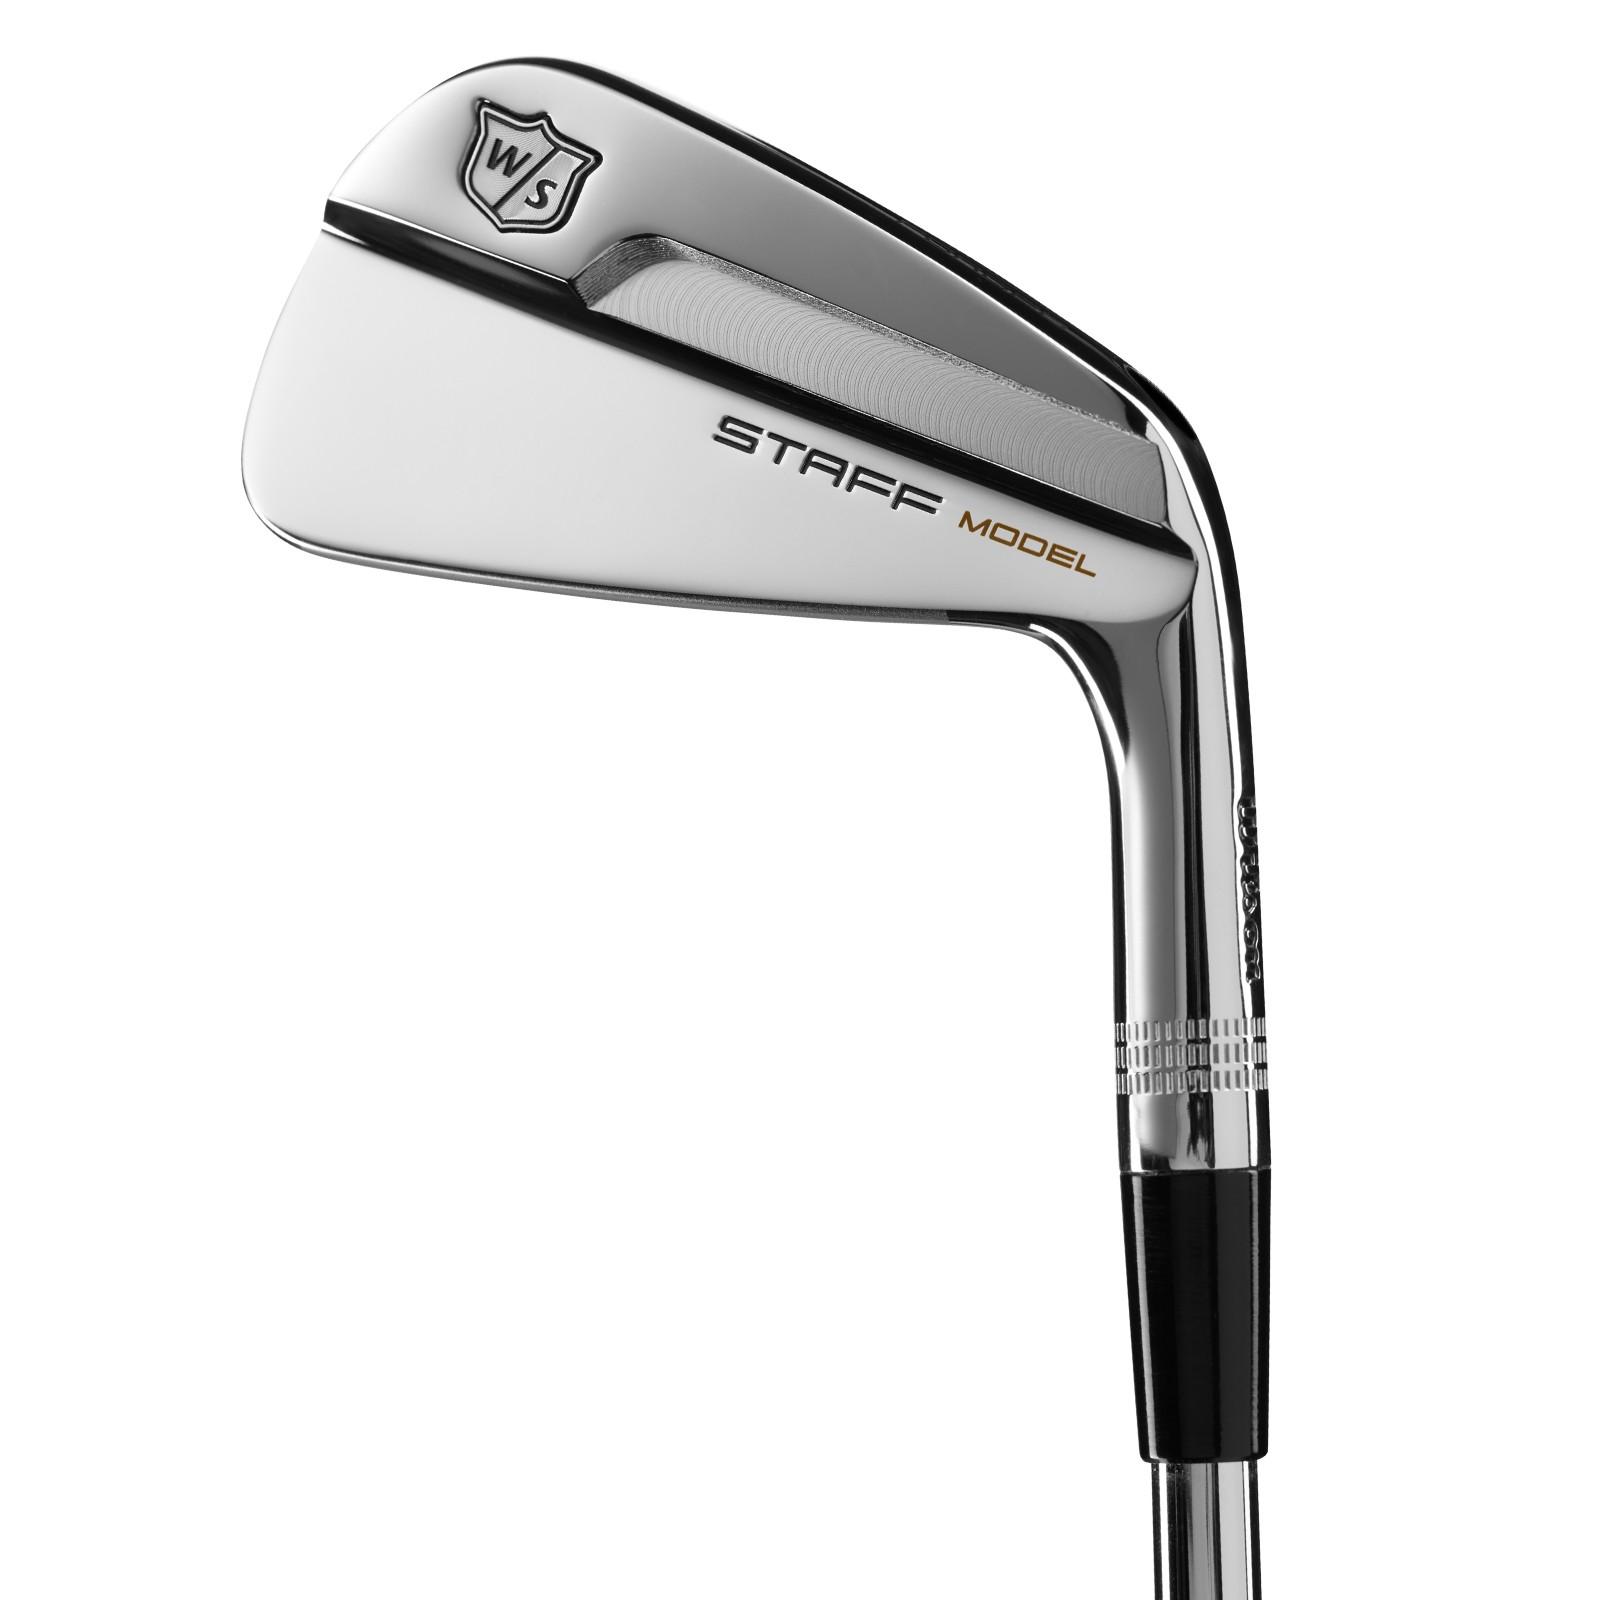 Wilson Staff Model Blade Golf Irons